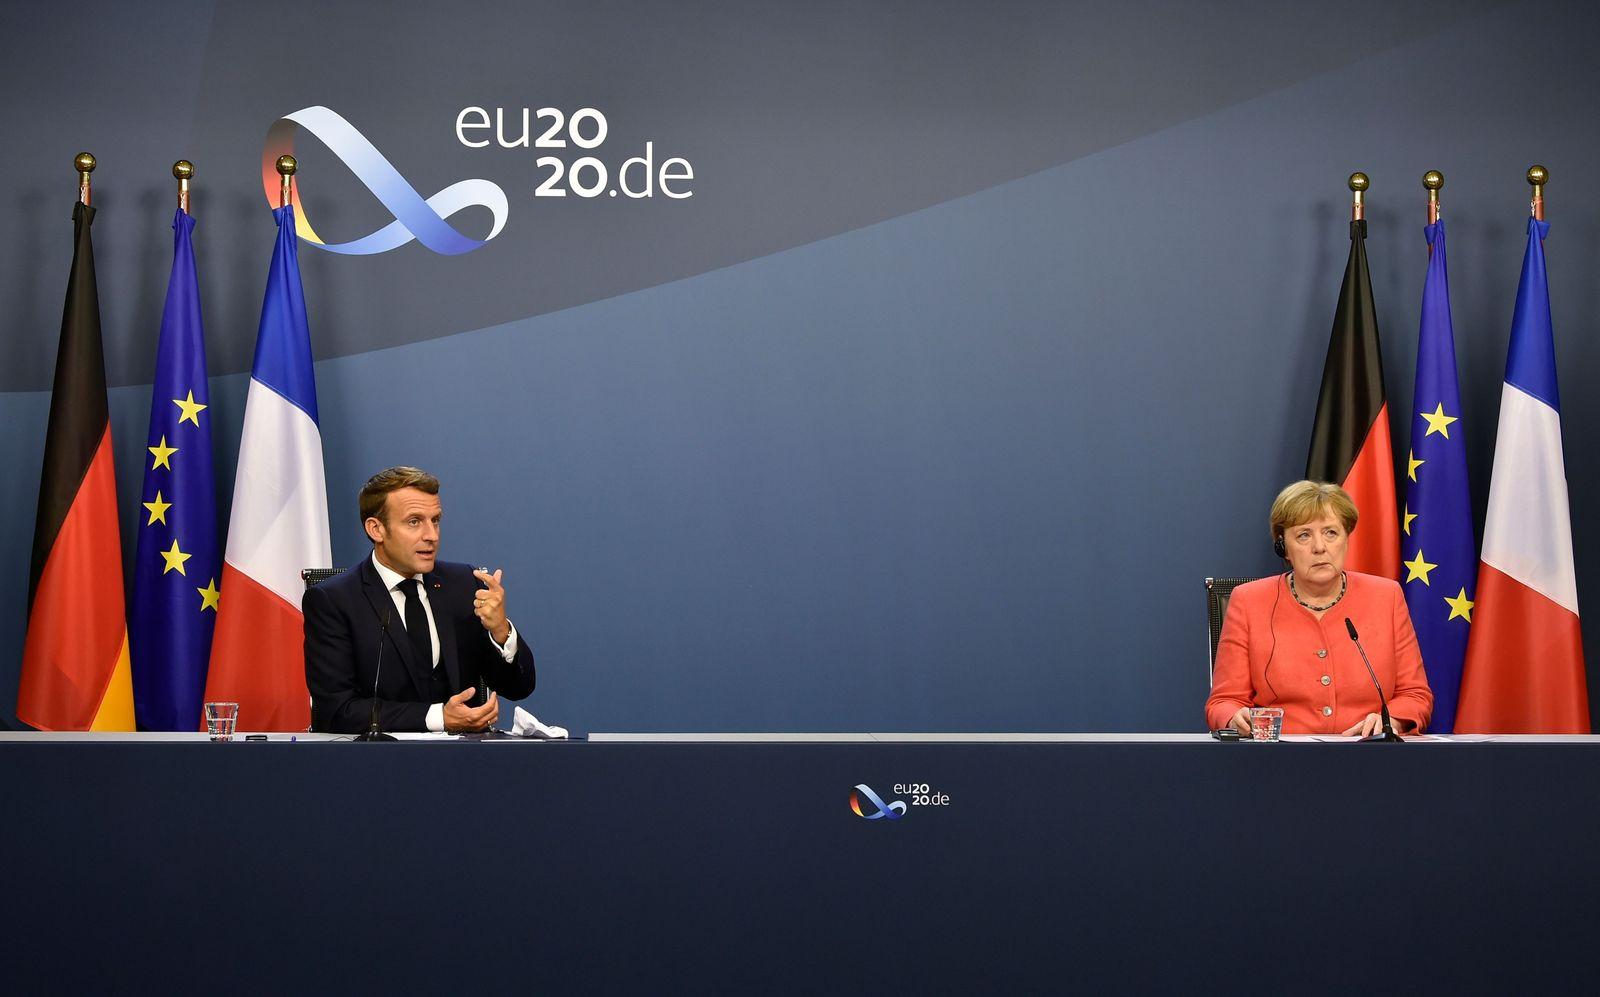 Special European Council in Brussels, Belgium - 21 Jul 2020